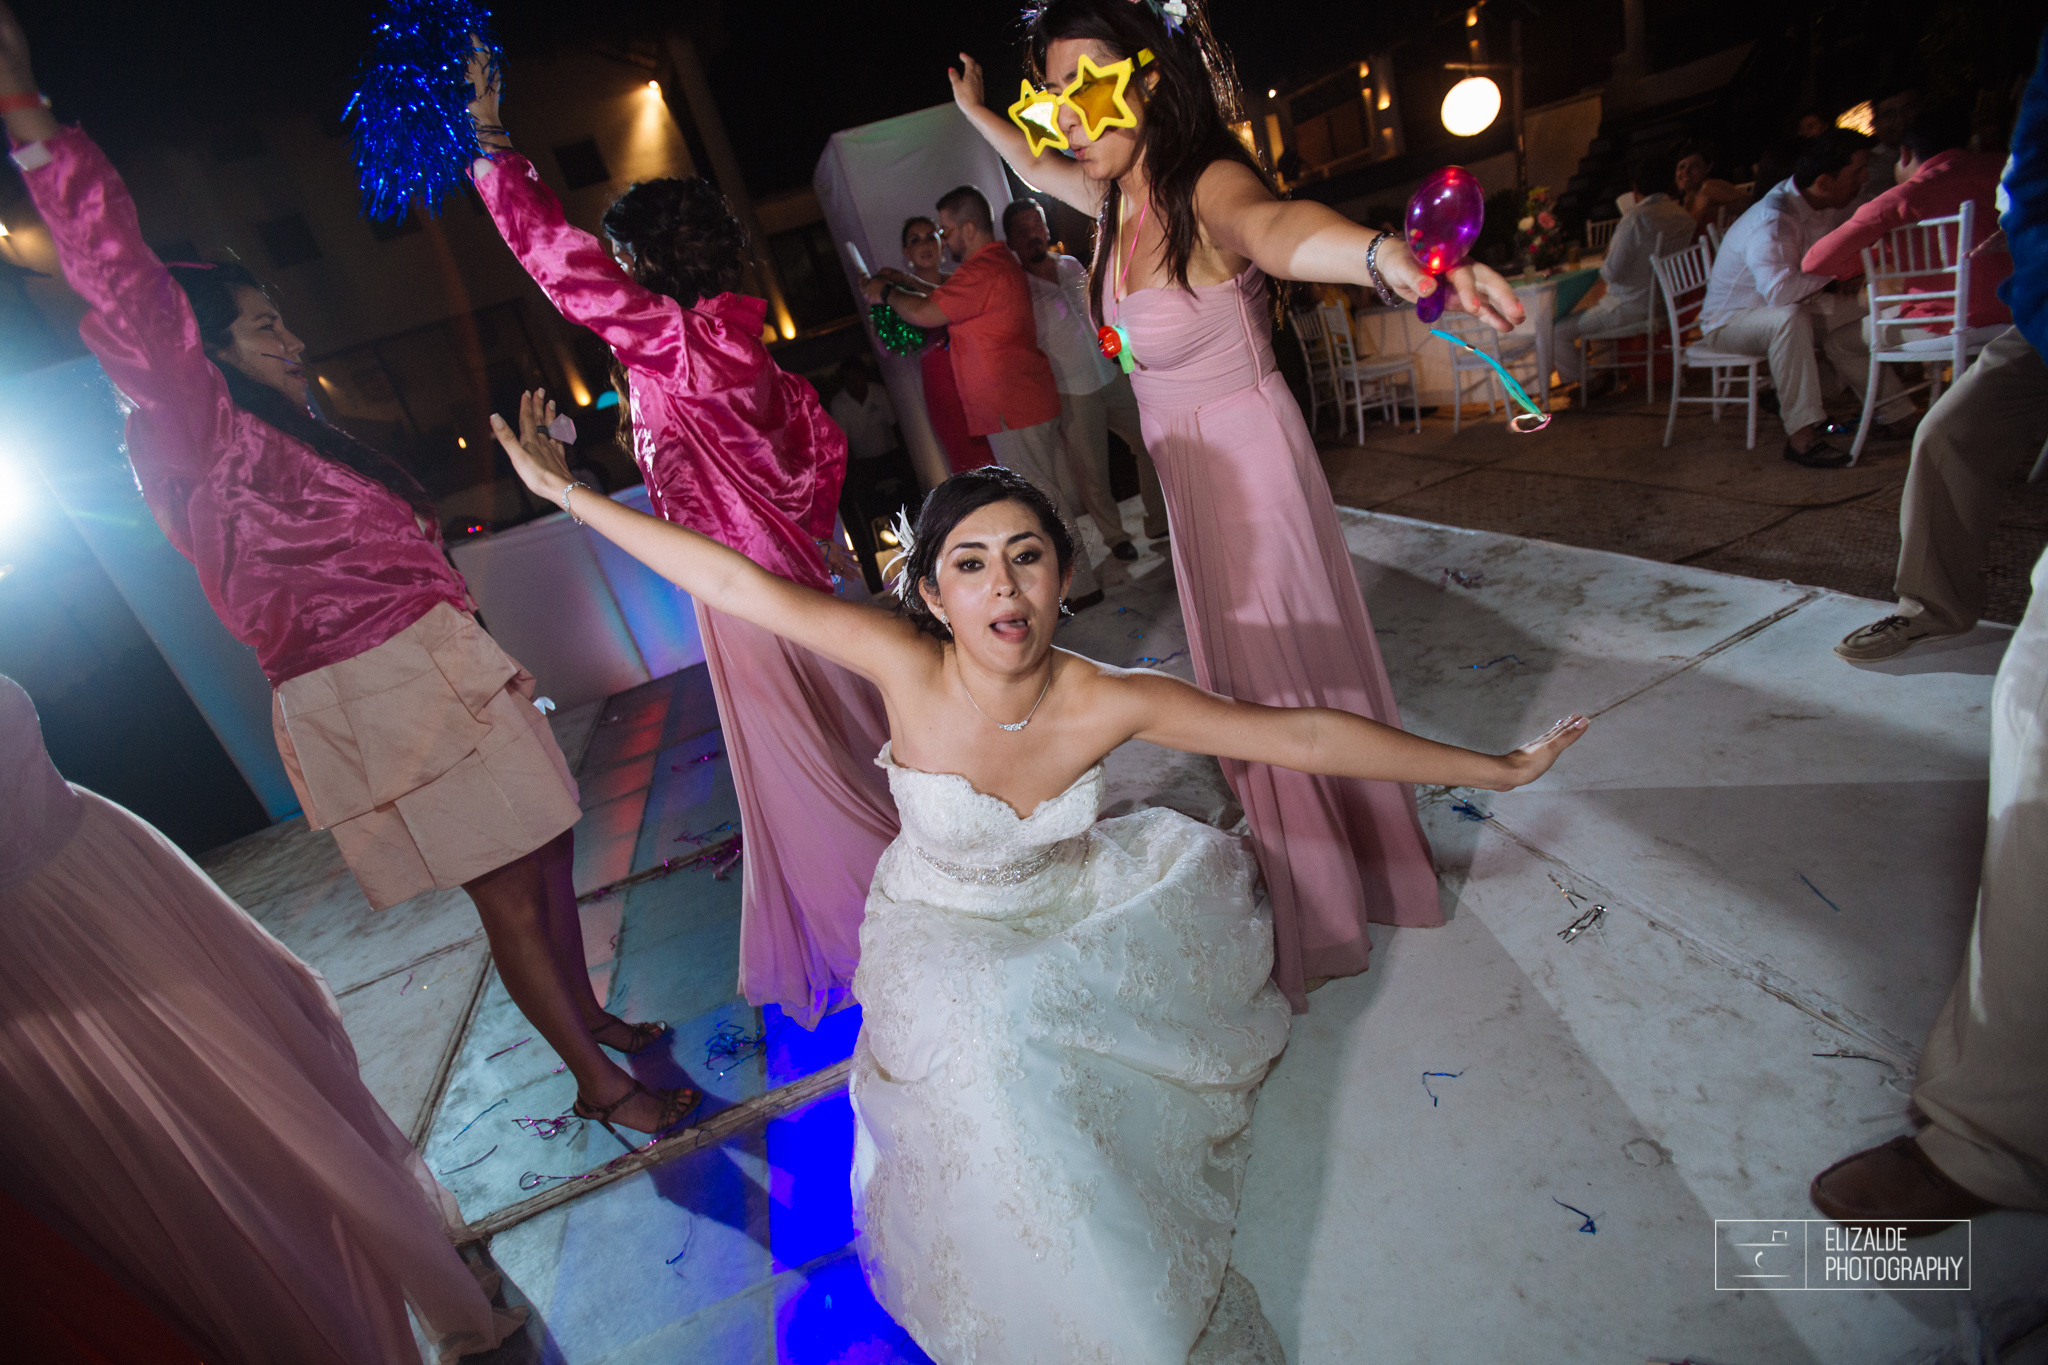 Pay and Ferran_Acapulco_Destination Wedding_Elizalde Photography-149.jpg